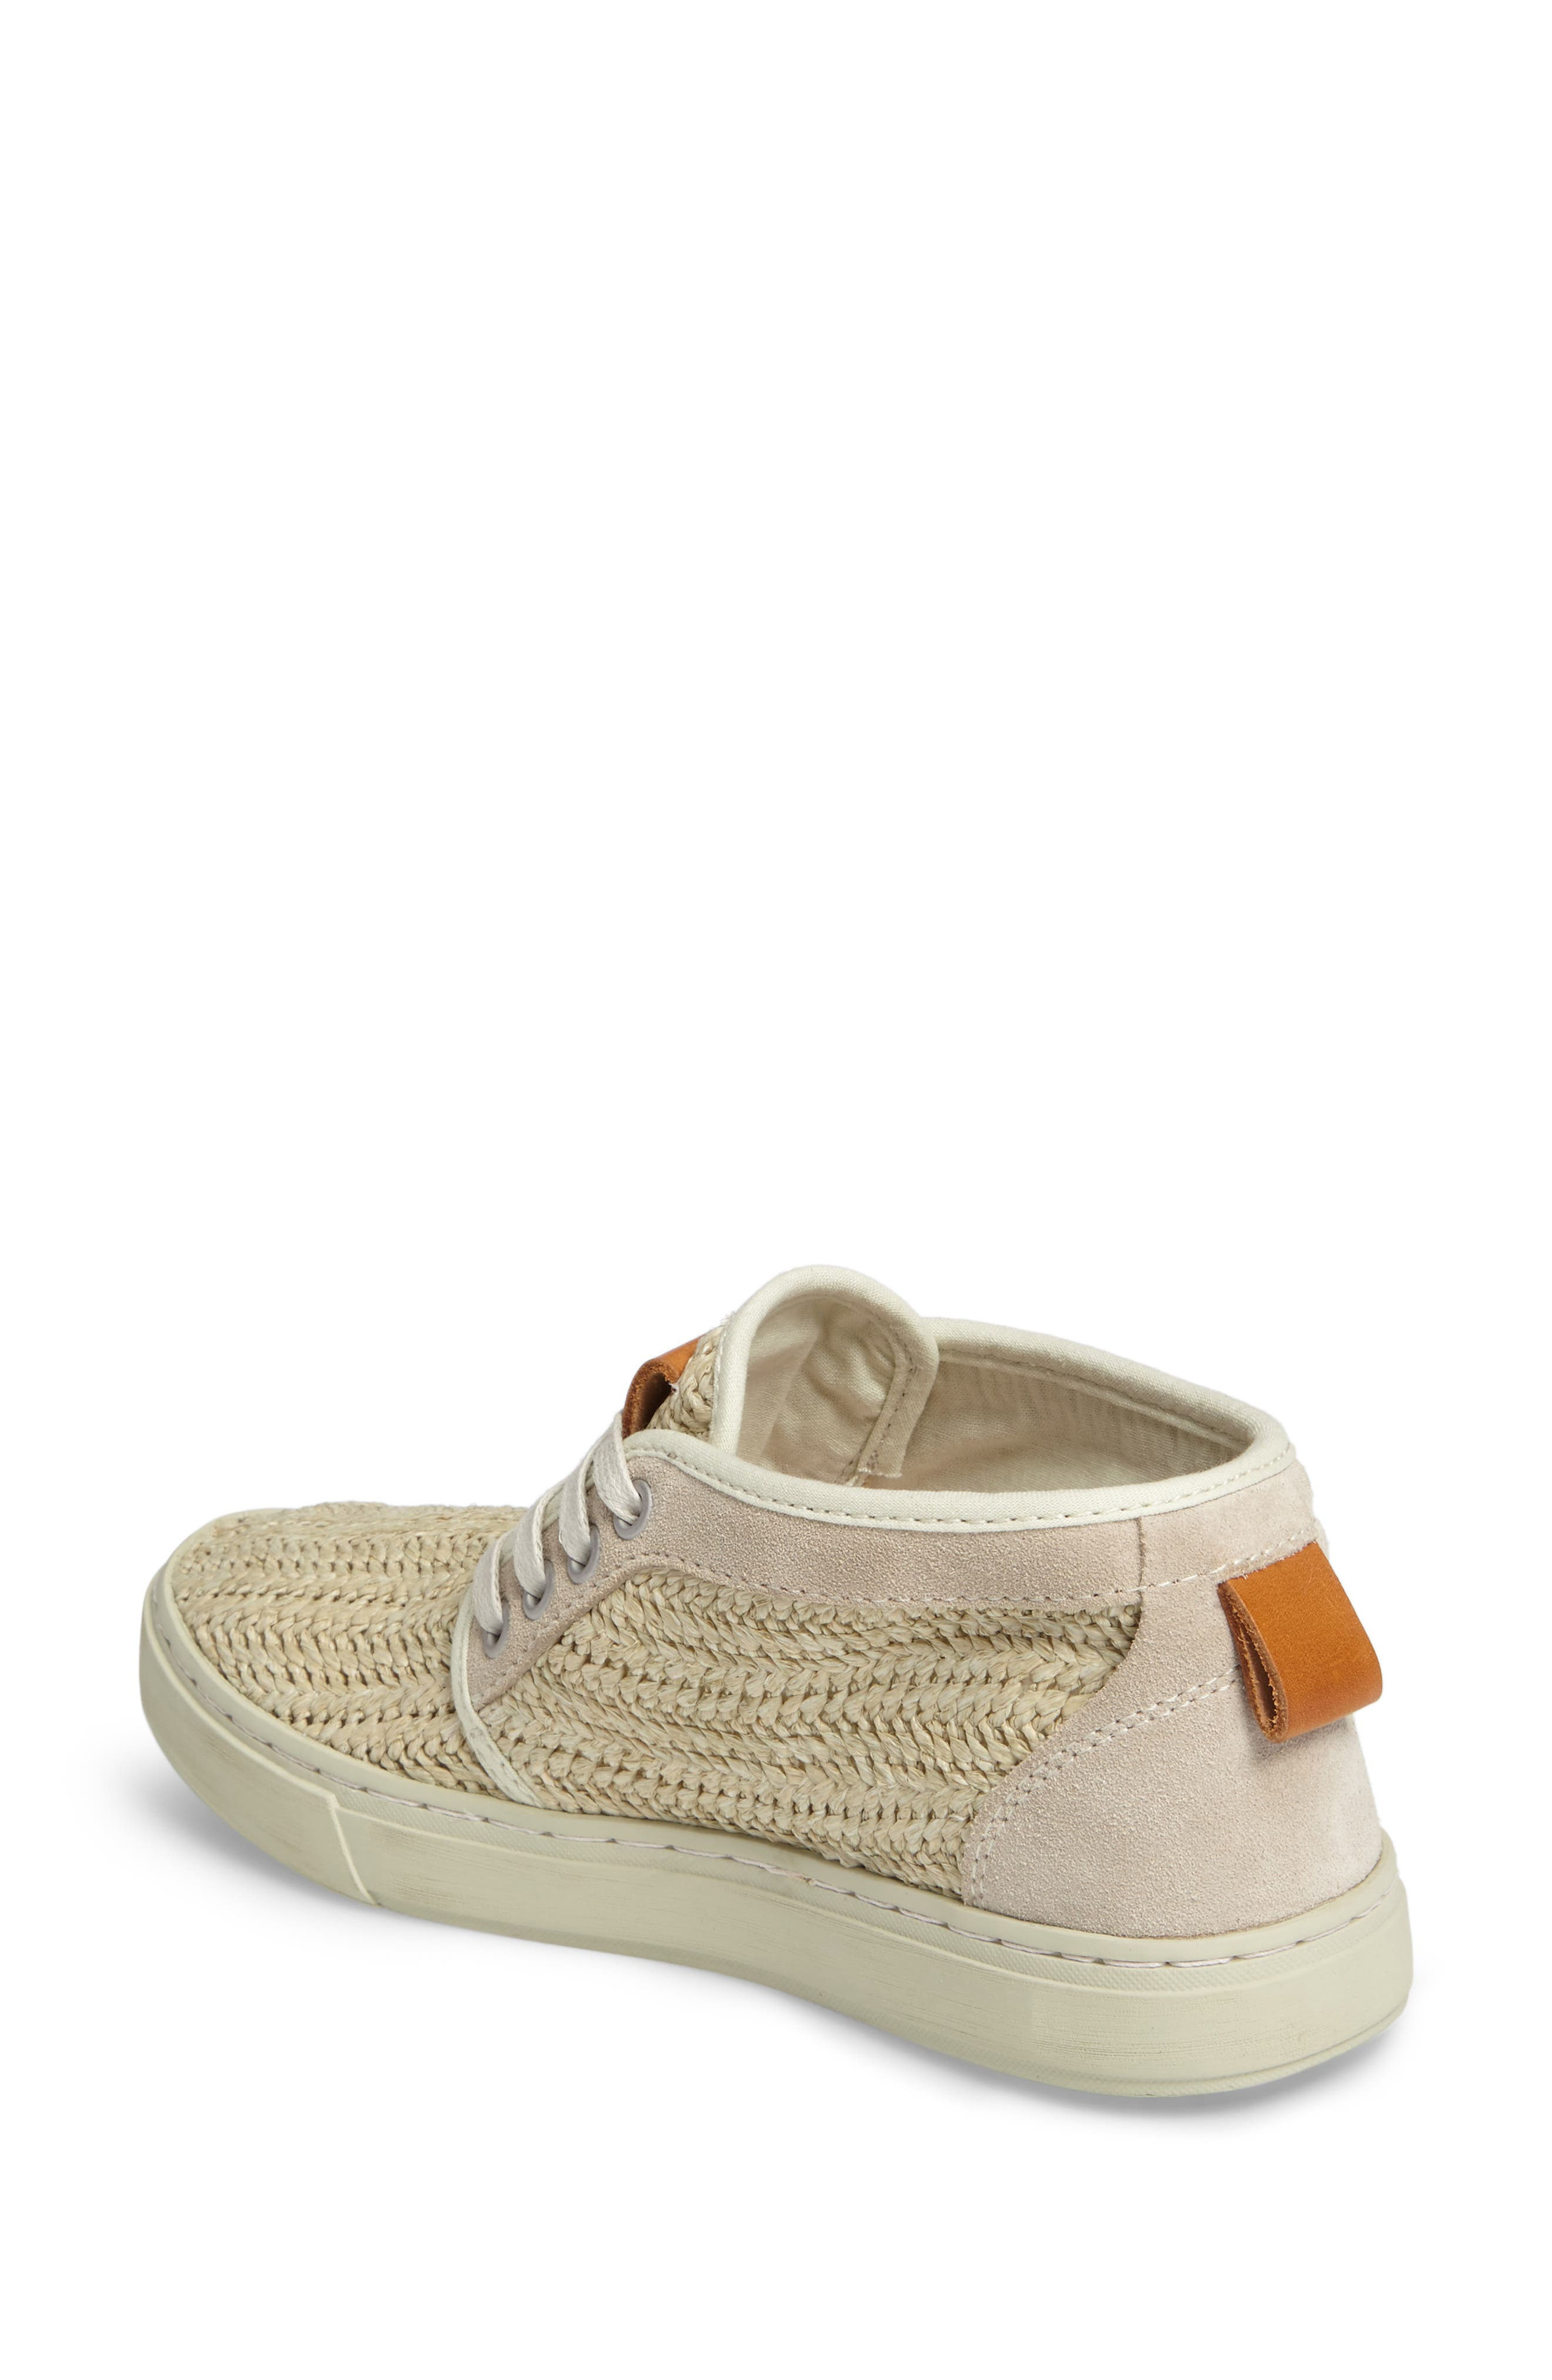 Hamoru Woven High Top Sneaker,                             Alternate thumbnail 2, color,                             YESO FABRIC